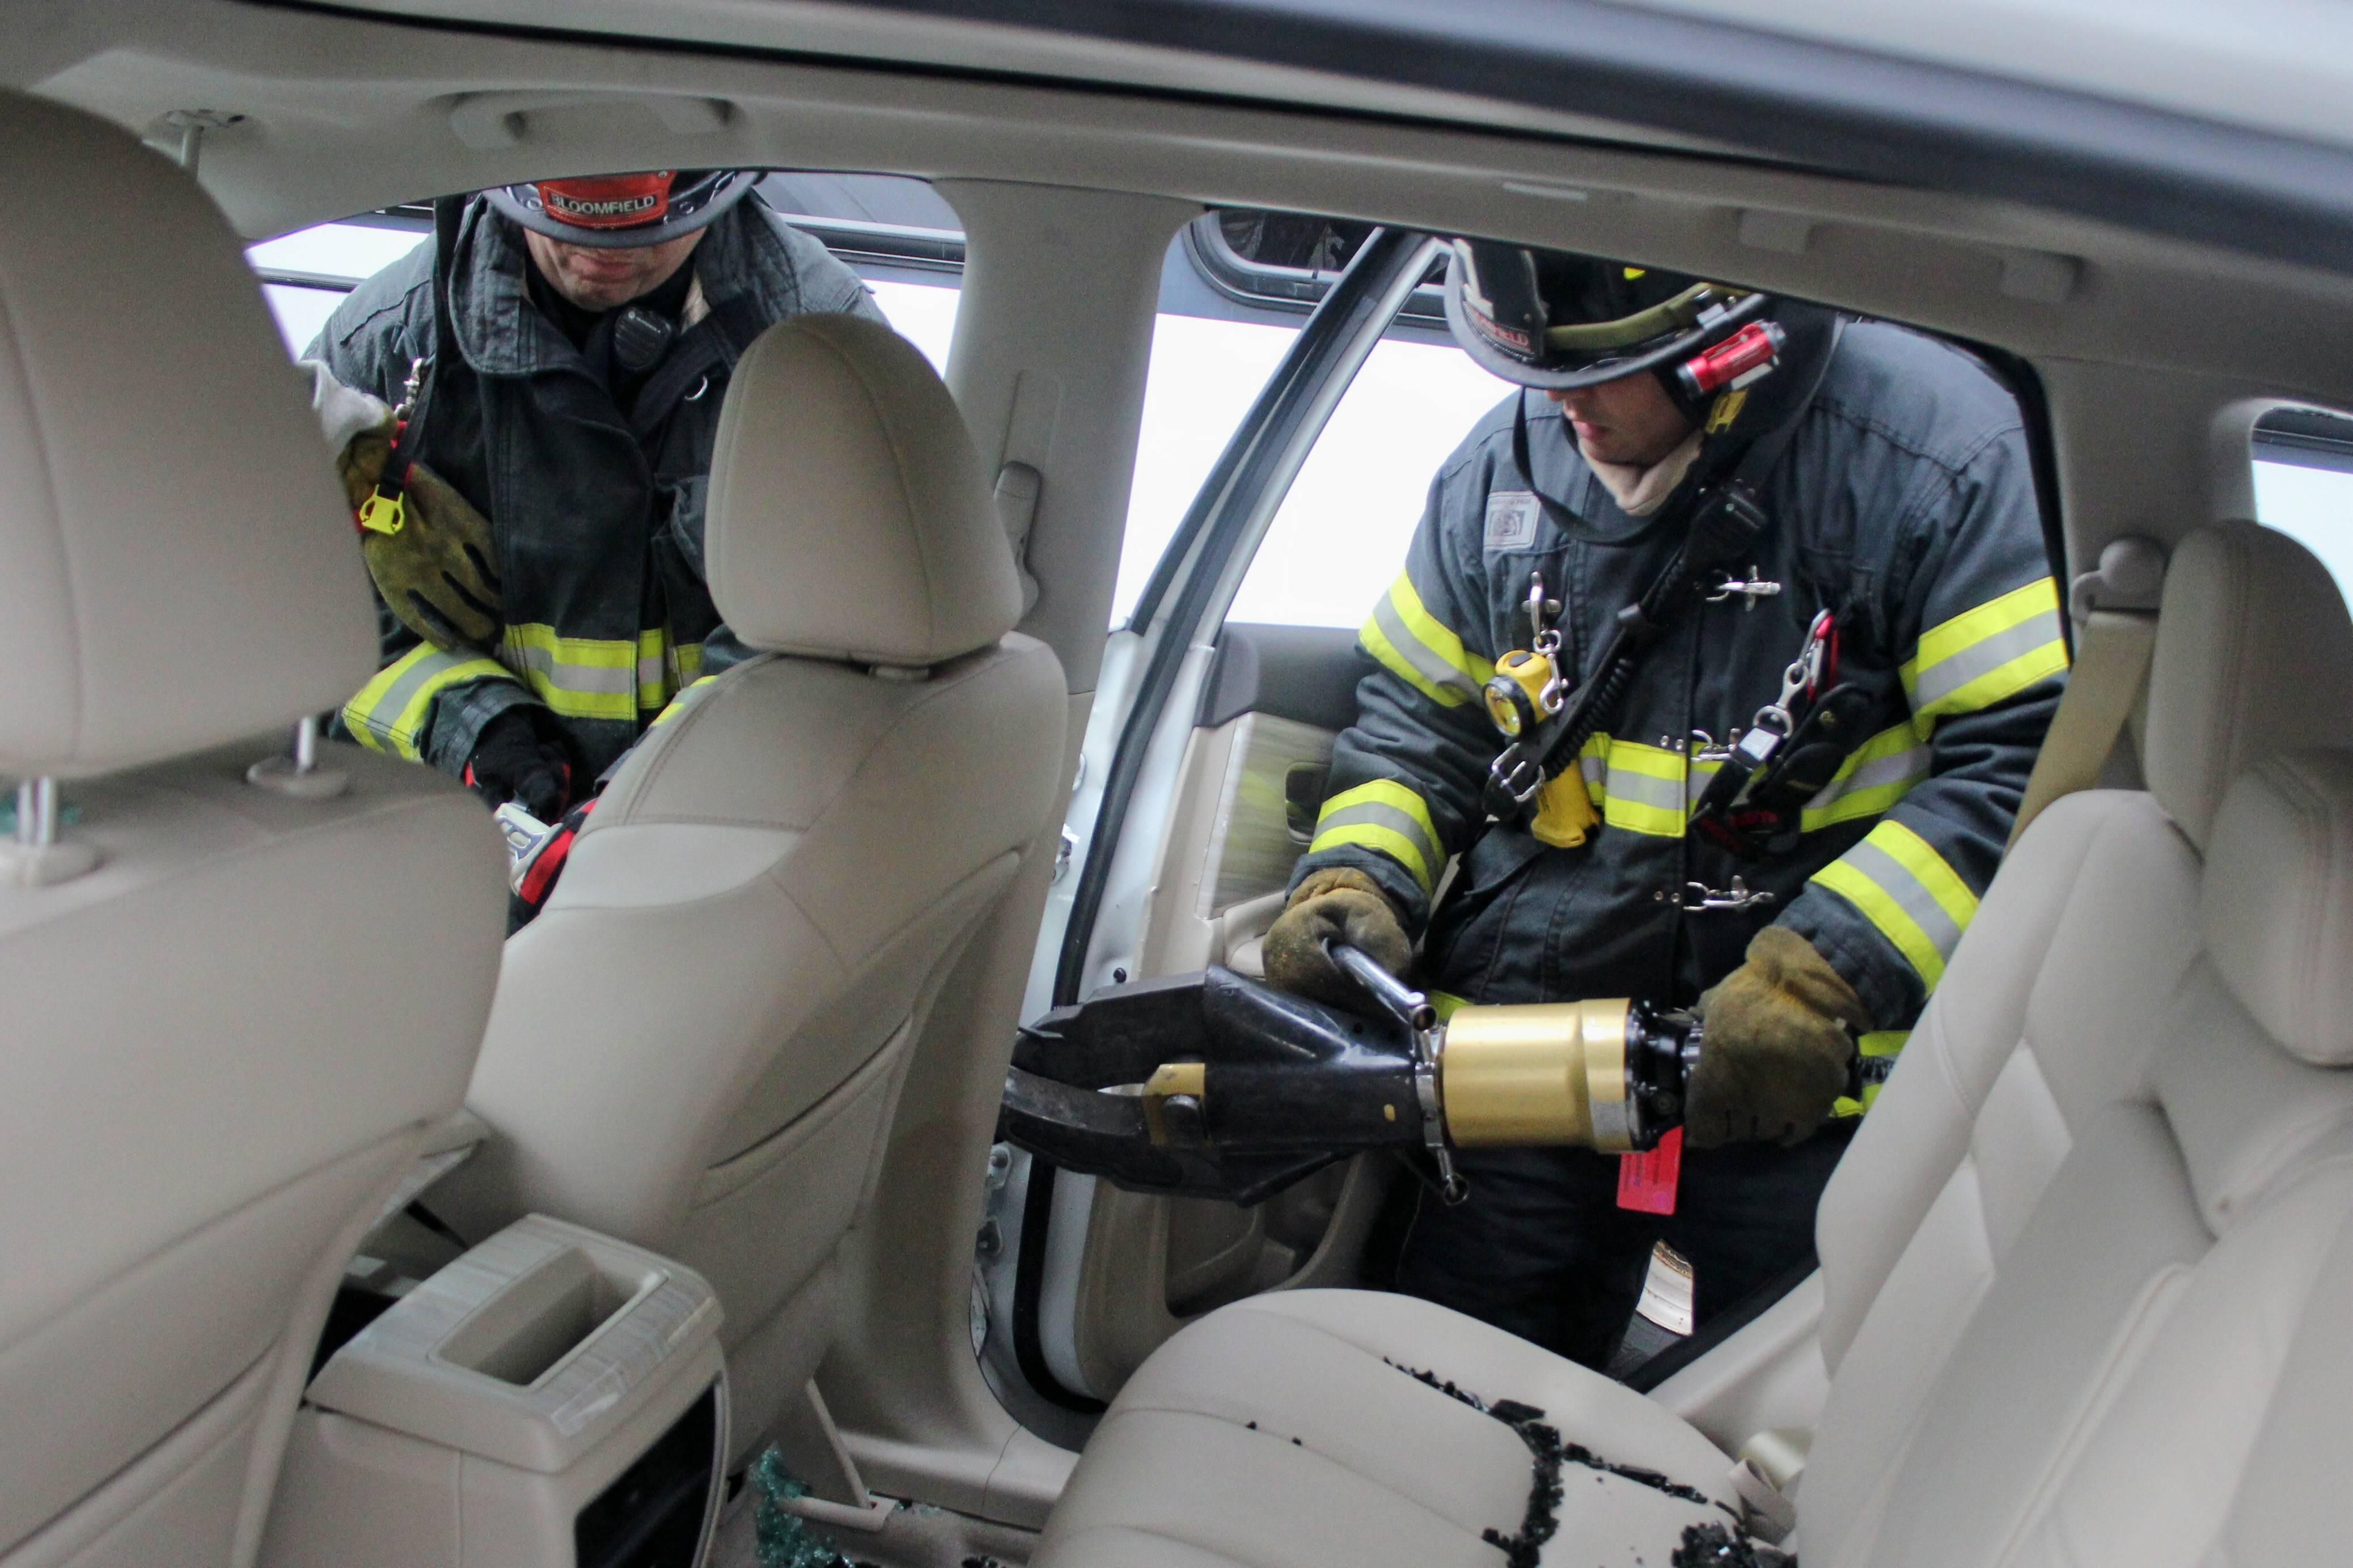 71a09fc0c3fd9ac51189_Nissan_Murano_Bloomfield_Fire_Department_Training_038.jpg